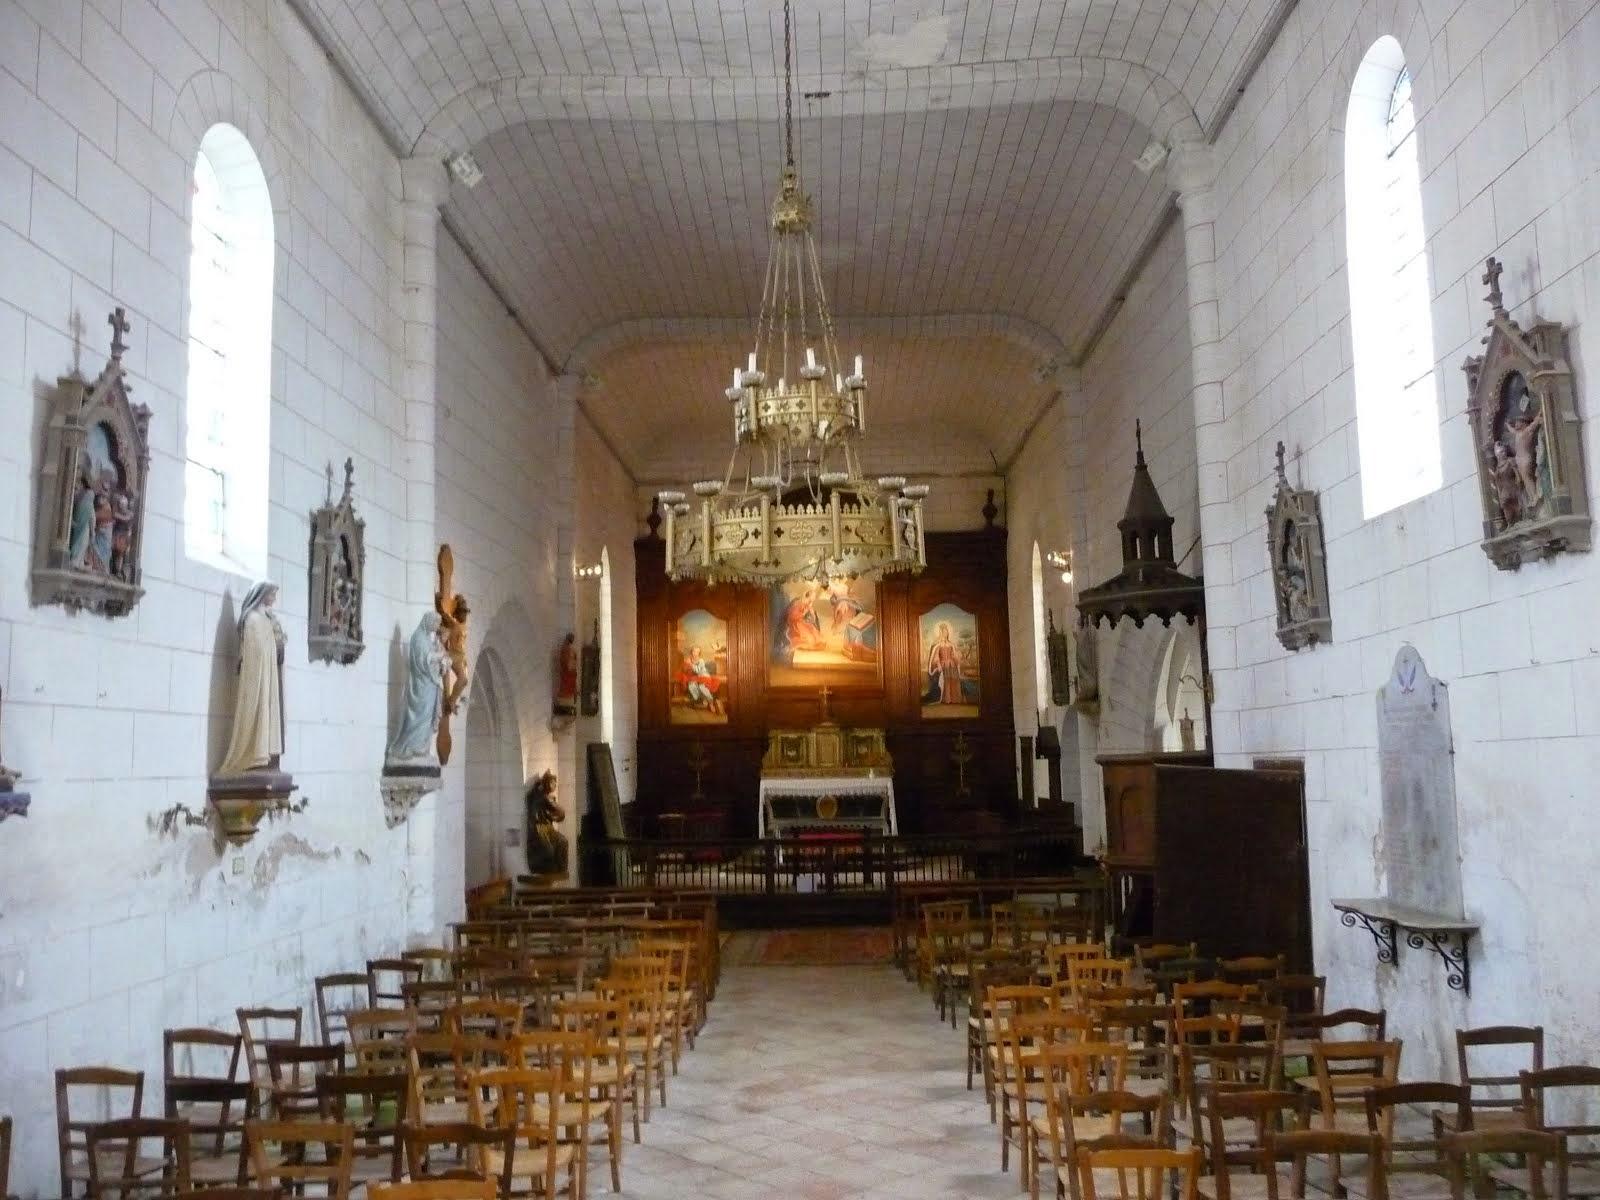 Interior view of Bonnes church